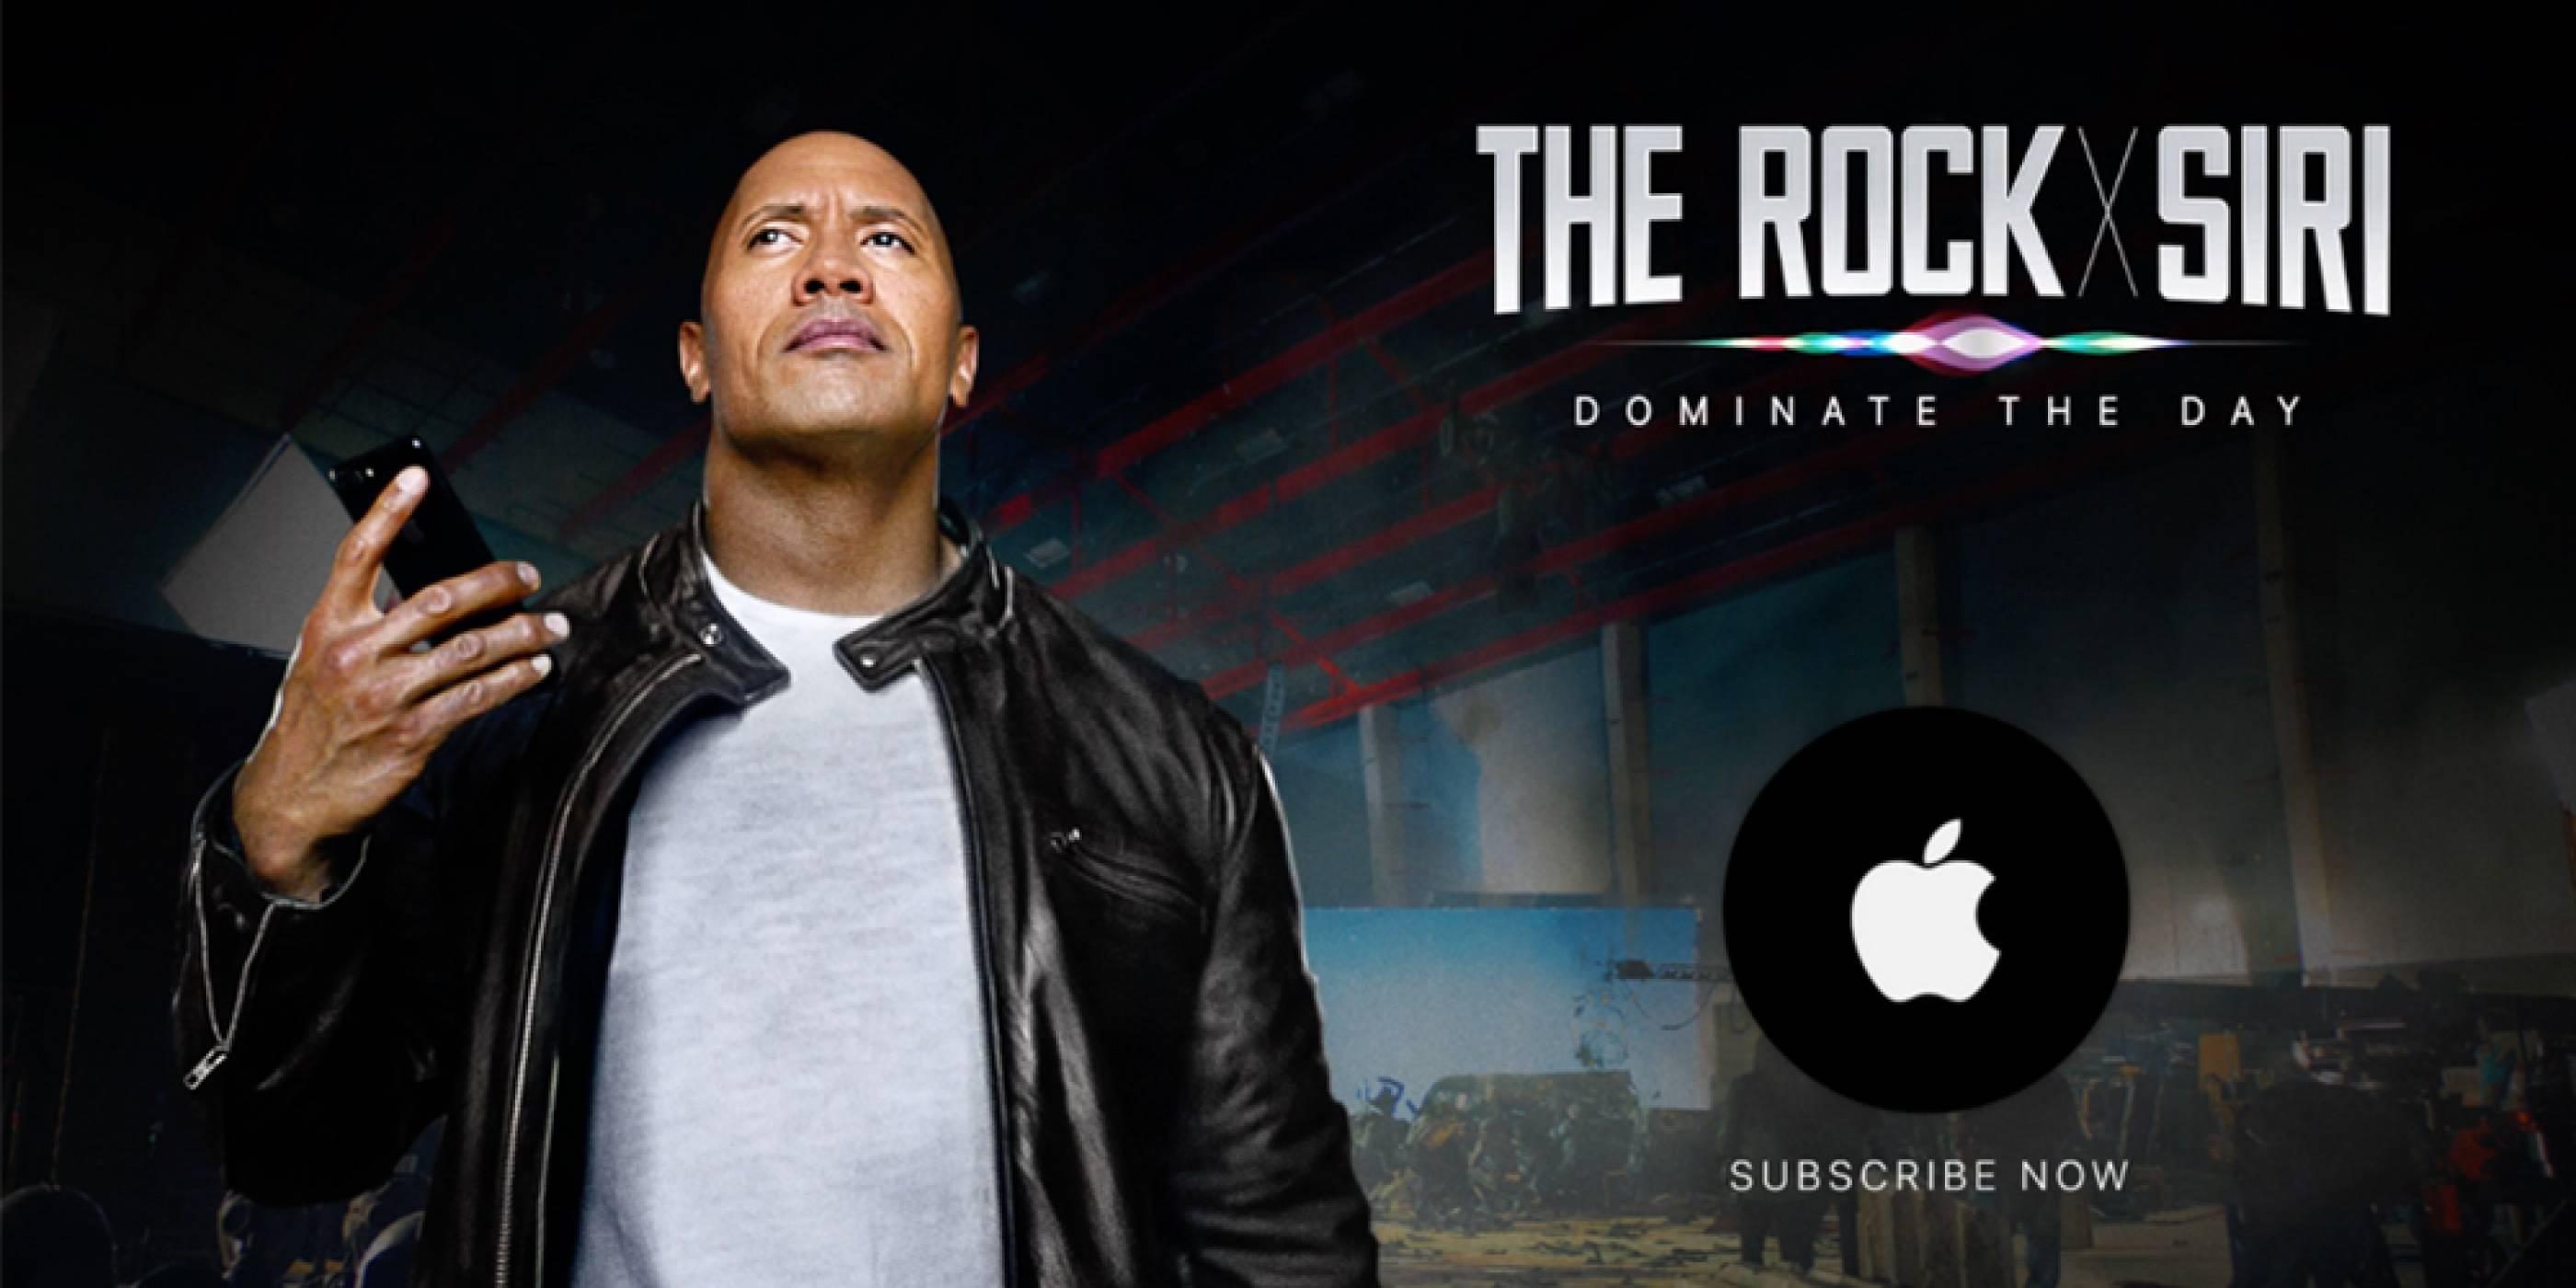 The Rock x Siri: Dominate The Day е новата надъхваща реклама на гласовия асистент на Apple